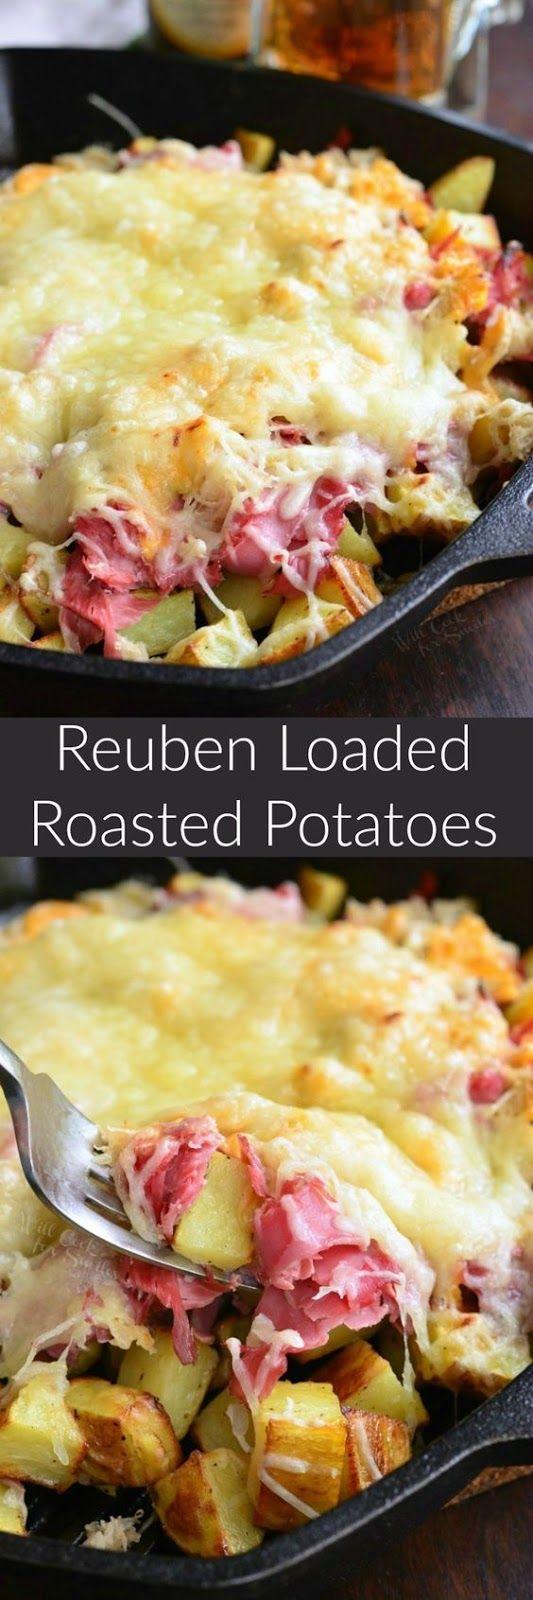 REUBEN LOADED ROASTED POTATOES | Cake And Food Recipe